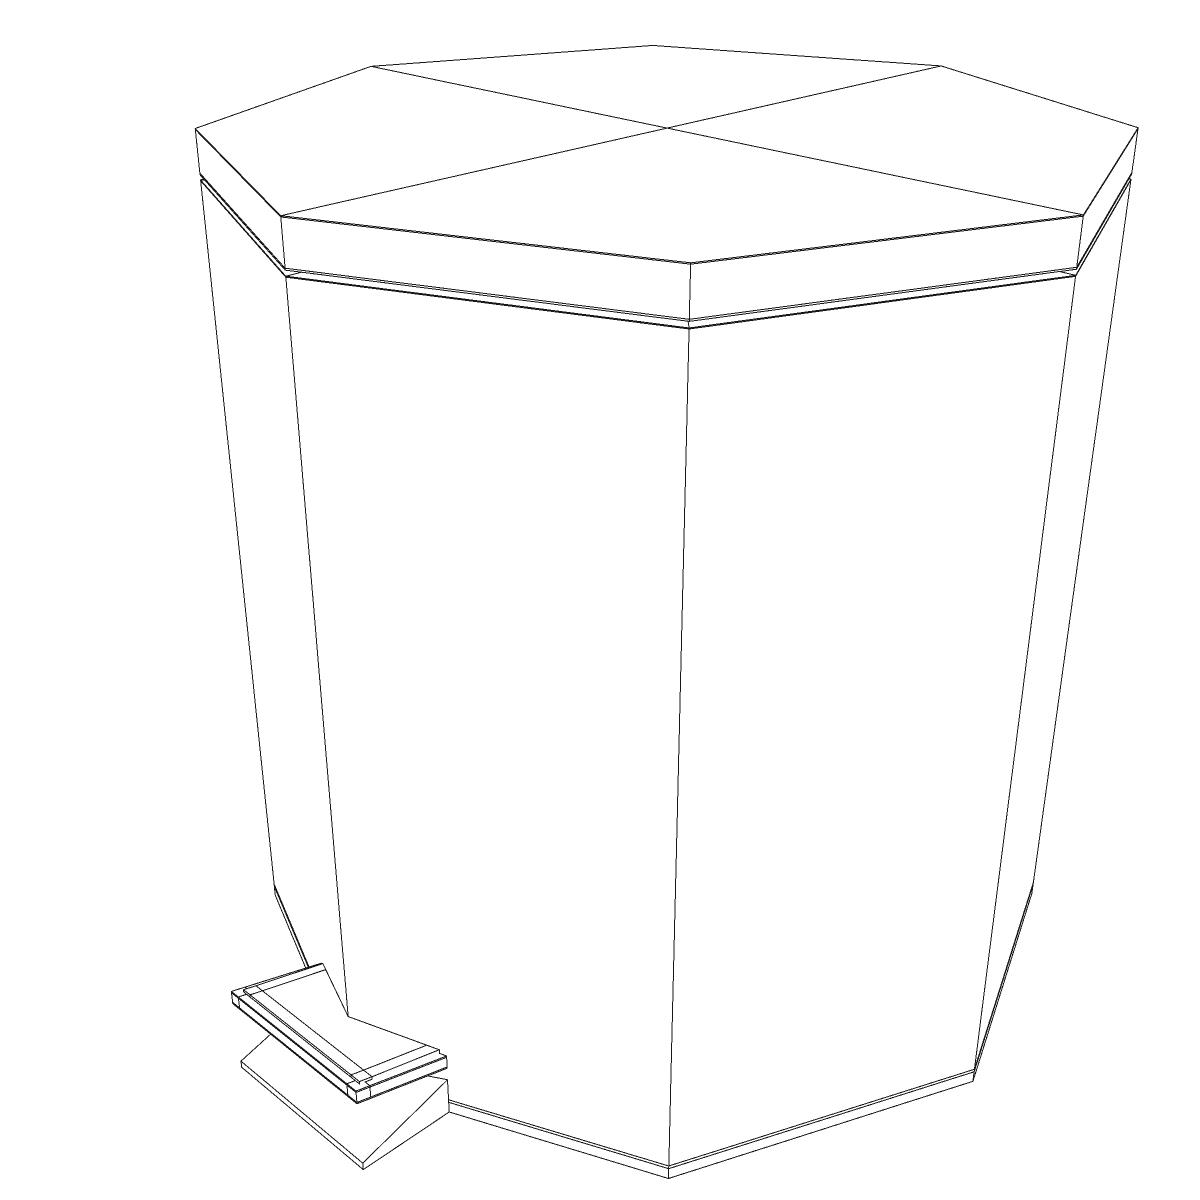 bathroom dumpster 3d model 3ds max fbx ma mb obj 155984